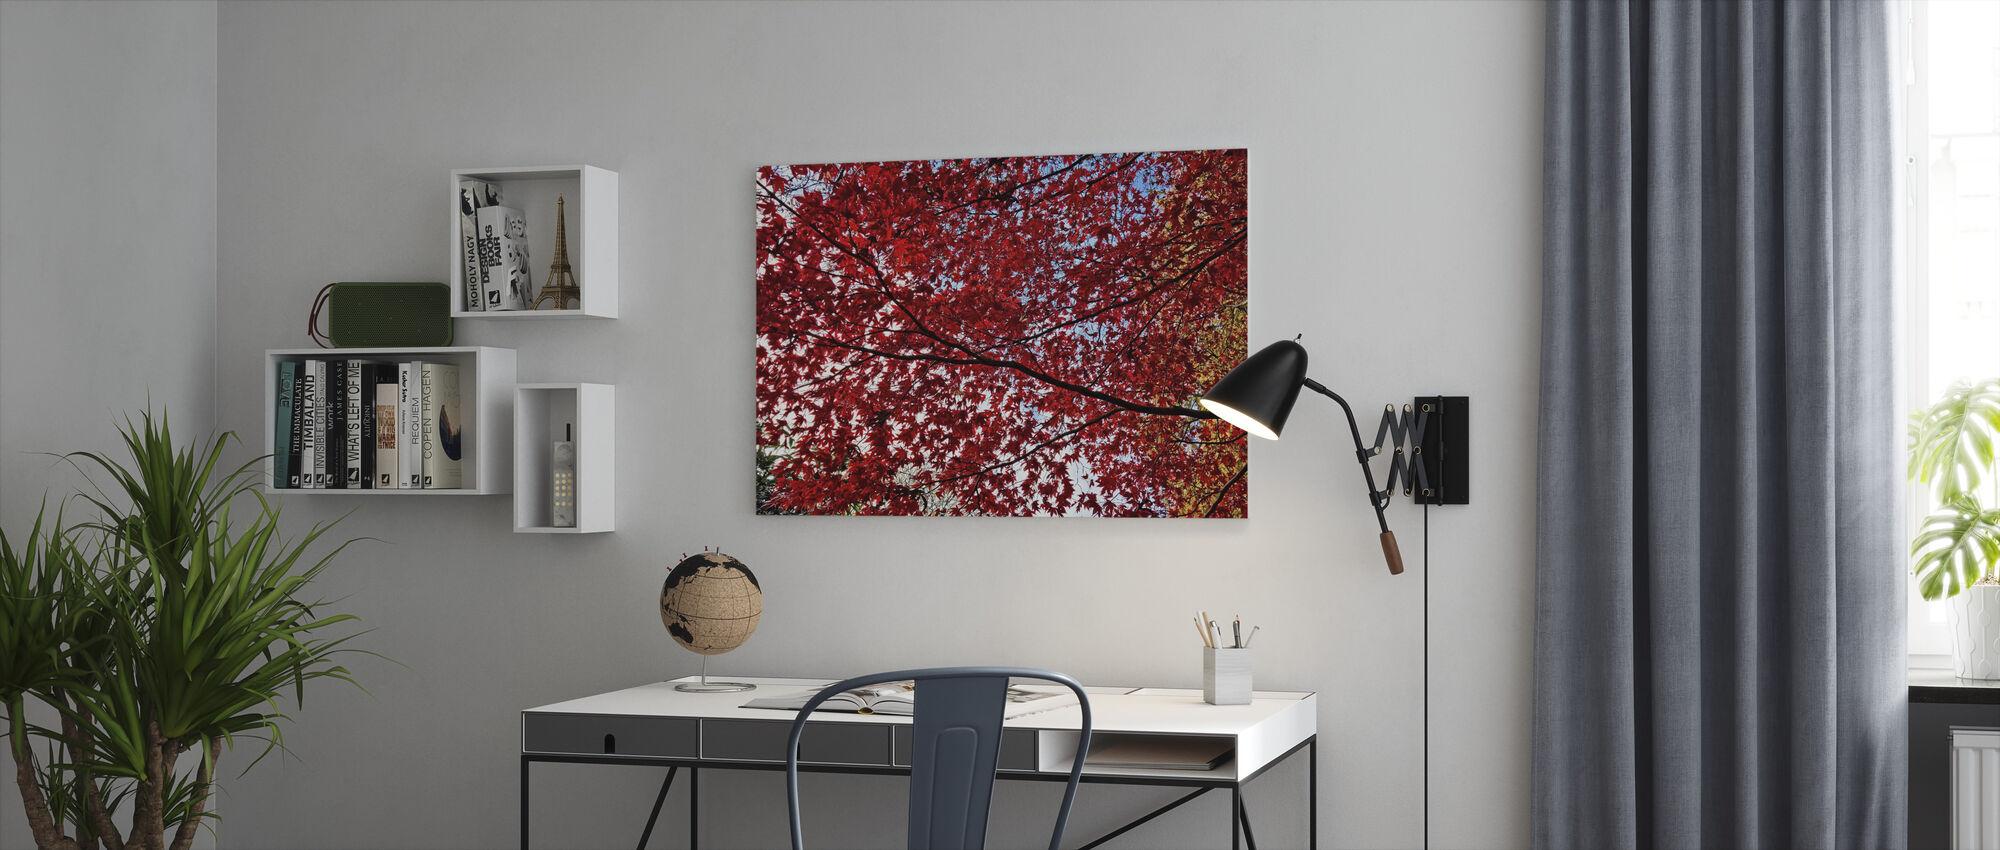 Autumn Leaves - Canvas print - Office